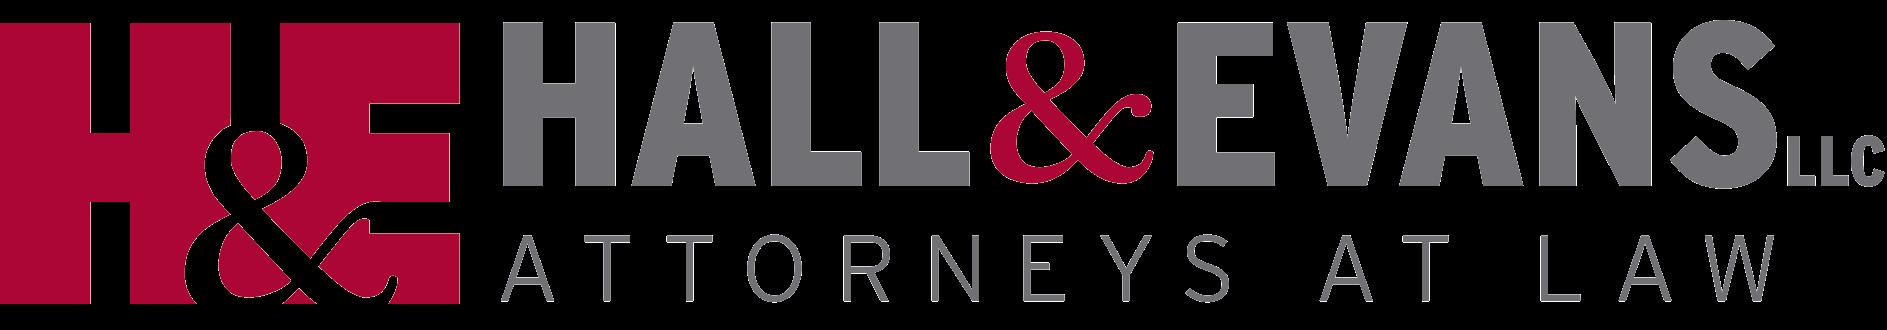 Hall & Evans logo